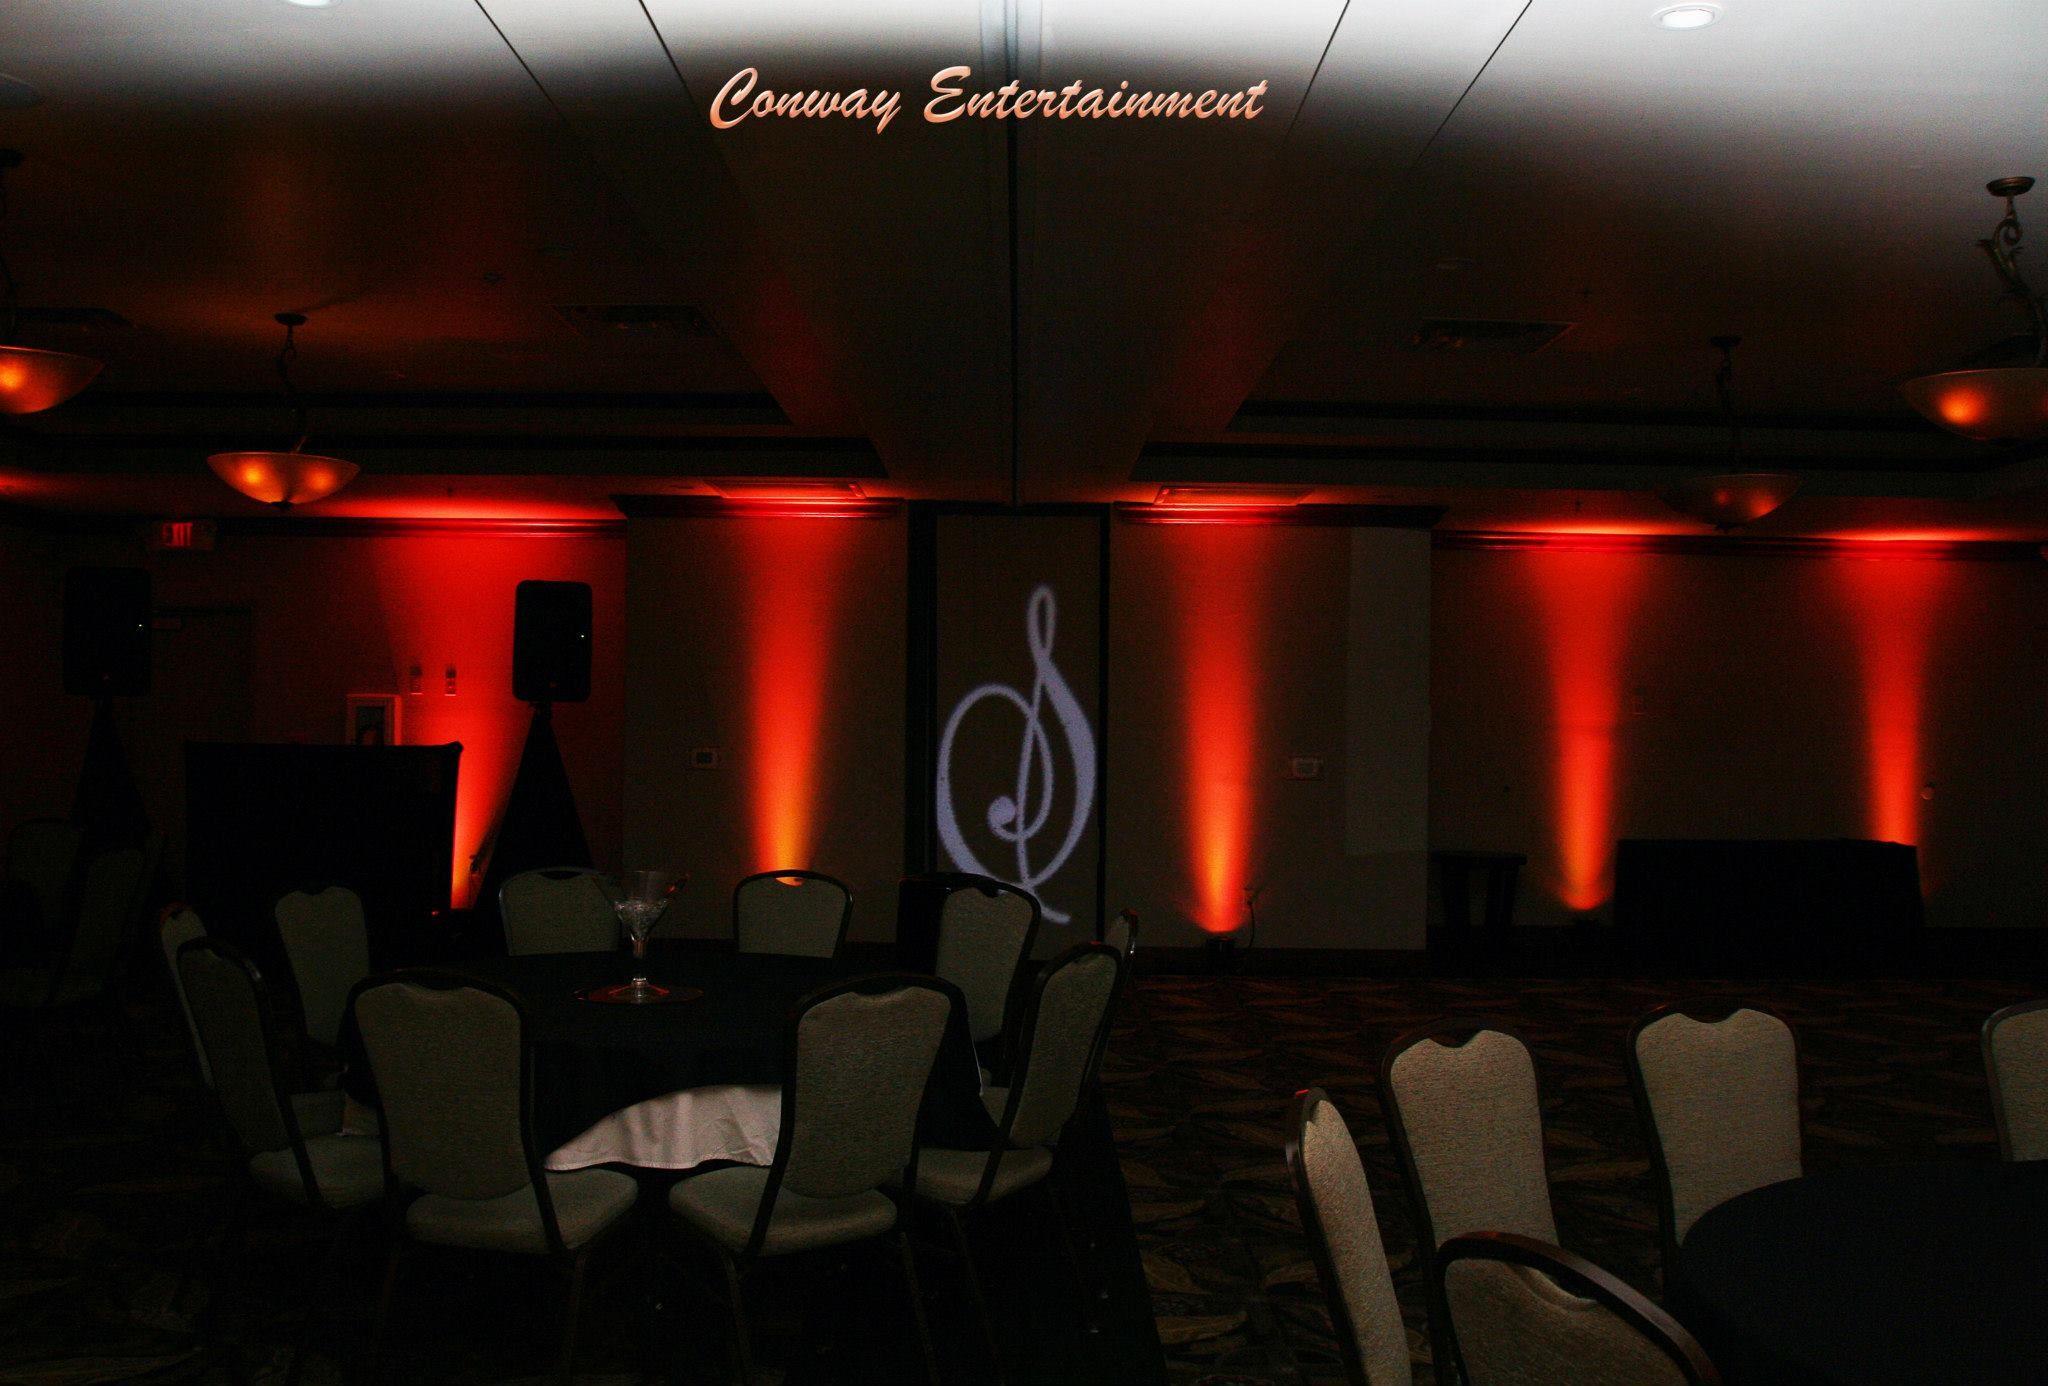 Orange Uplighting With S Gobo Lighting, At The Hilton Garden Inn   Conway.  Photo. Arkansas